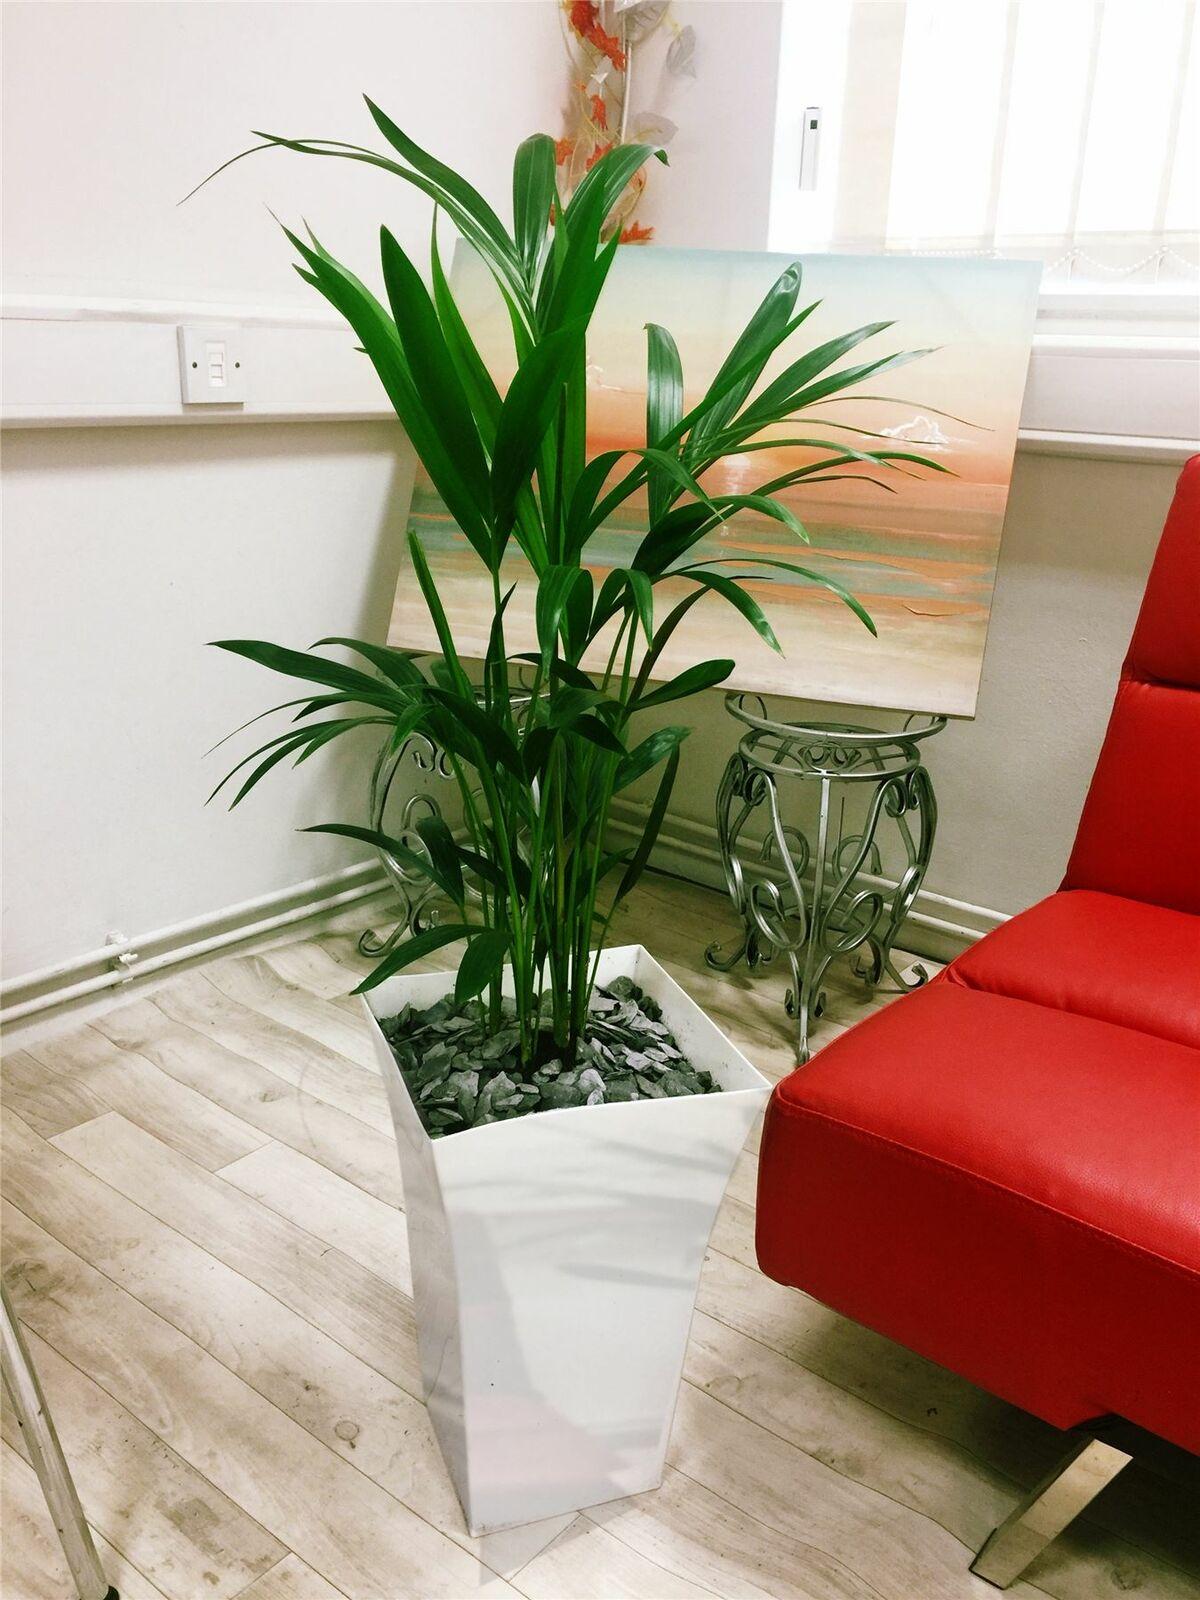 1 grandi Kentia Palma House Floor pianta in bianco lucido MILANO pot alto 90 - 100cm